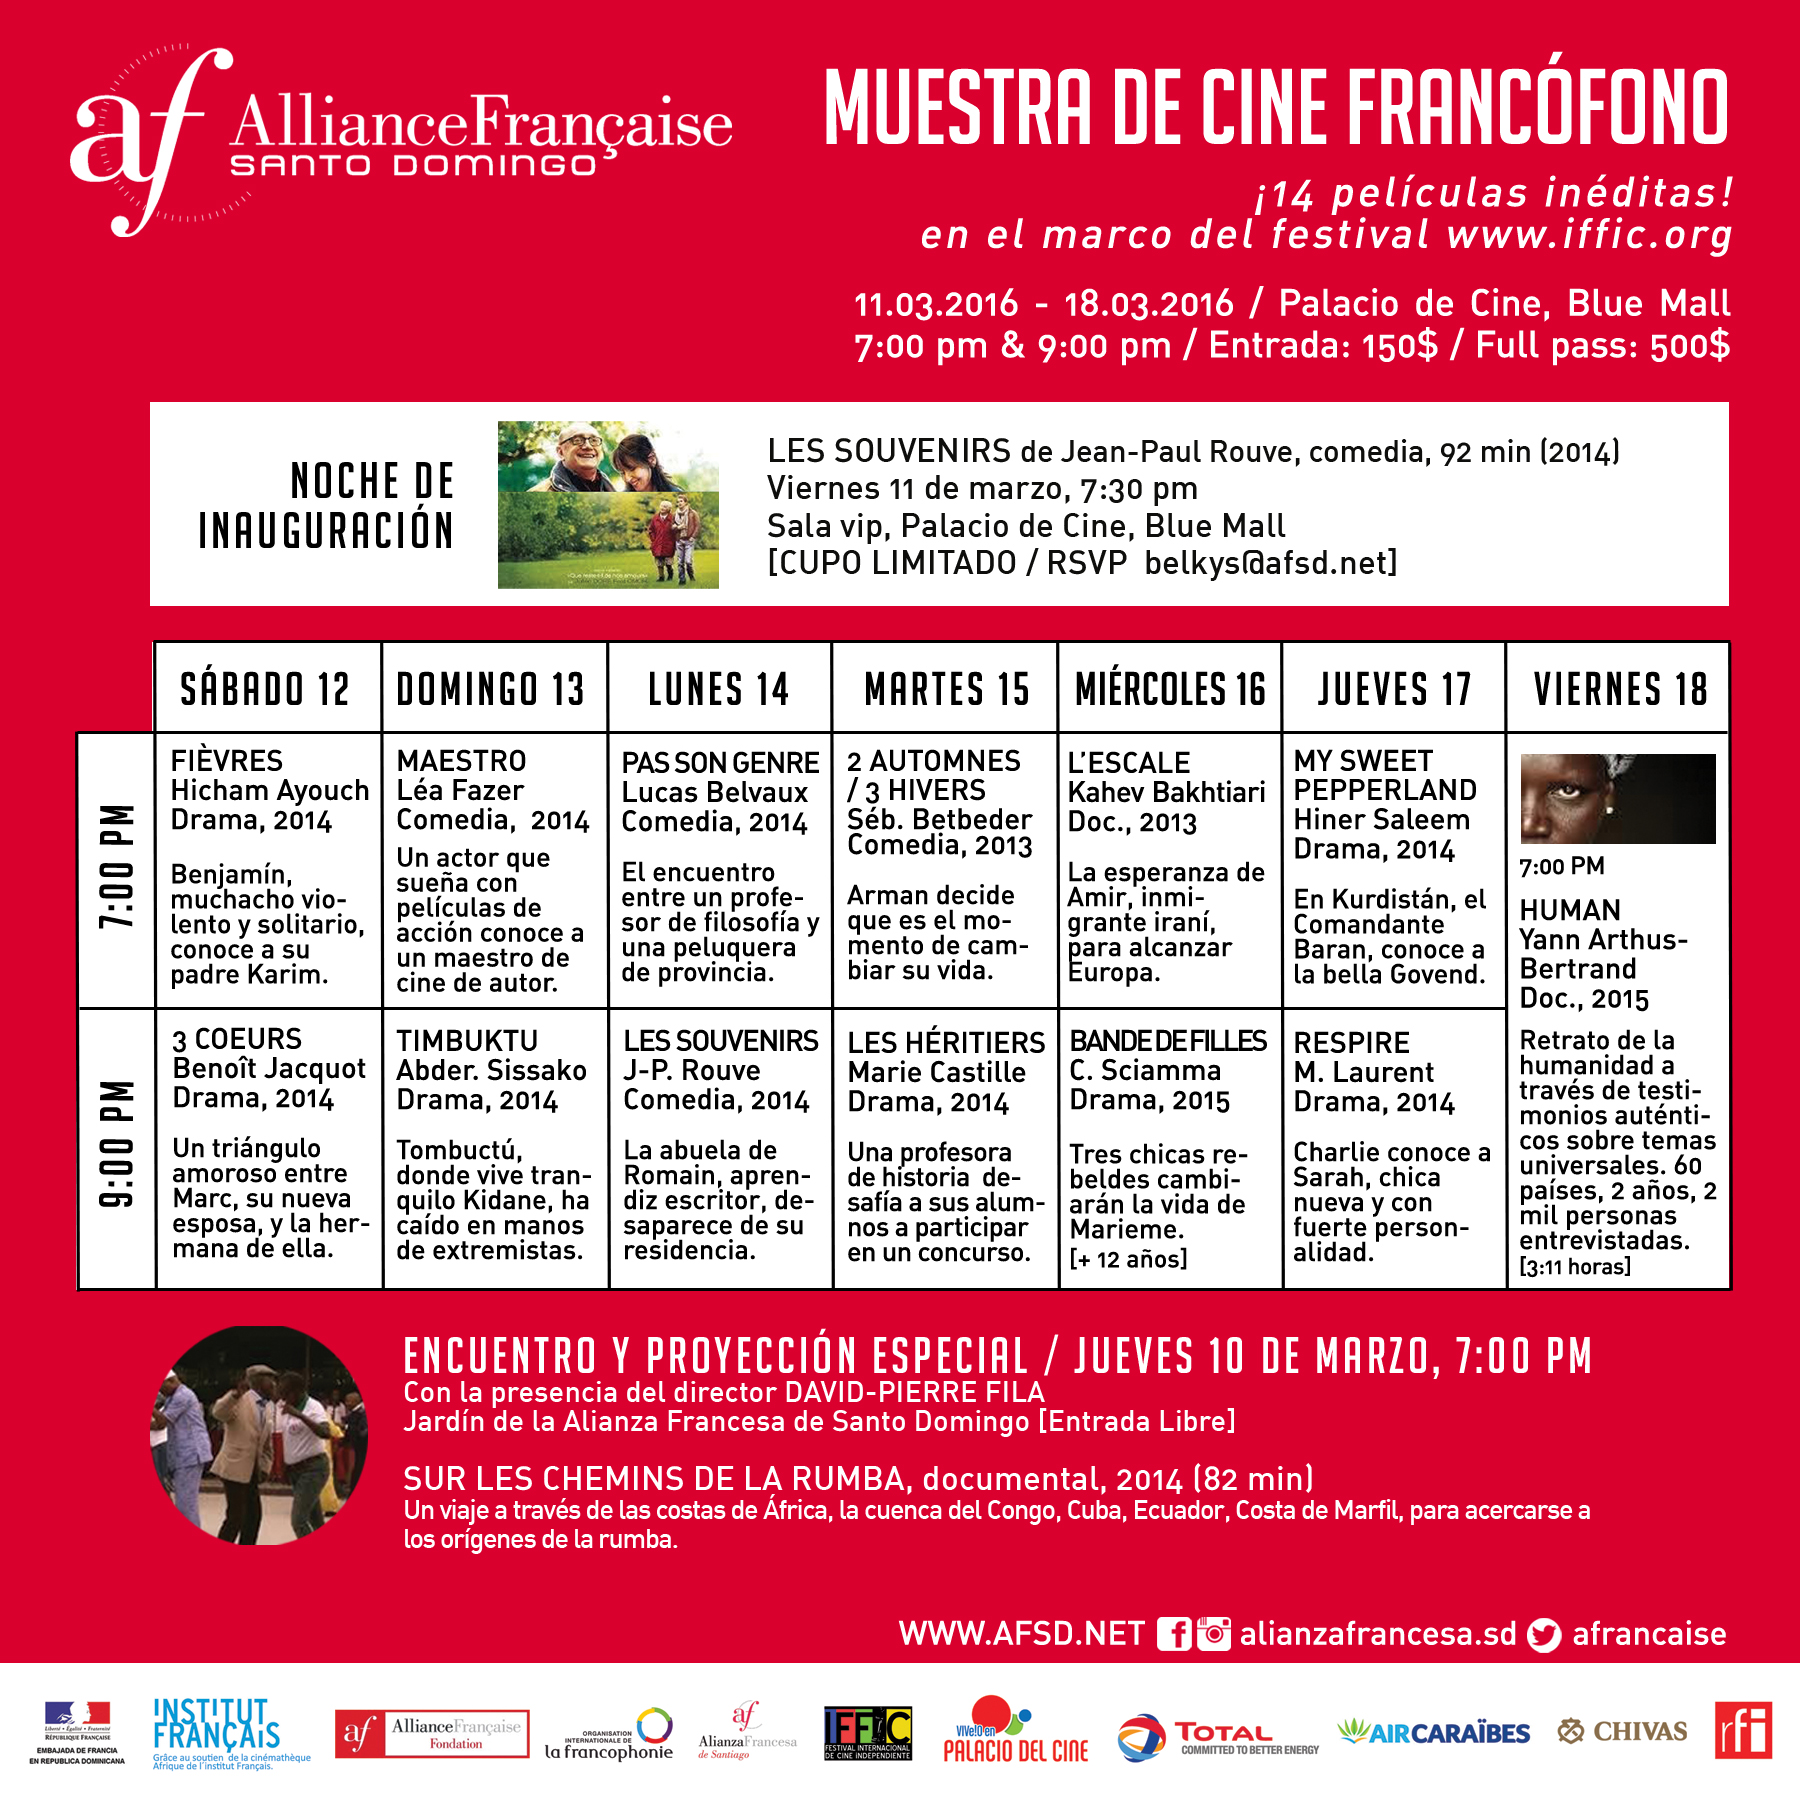 PROGRAMA COMPLETO - Muestra de cine francófono